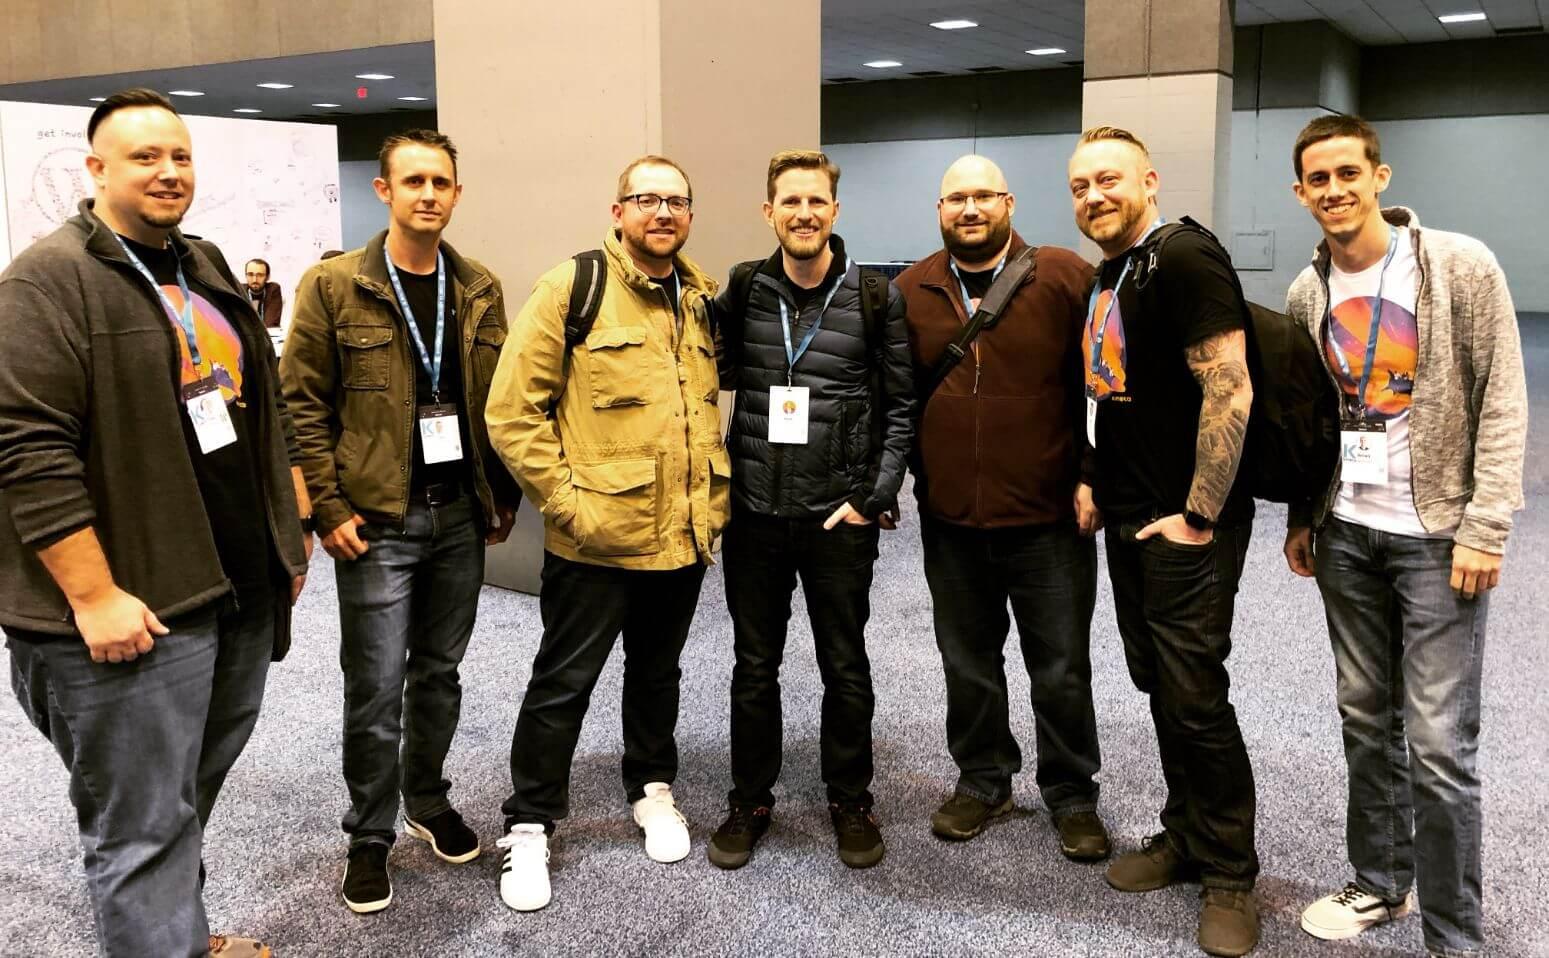 A equipe Kinsta com Matt Mullenweg no WordCamp US